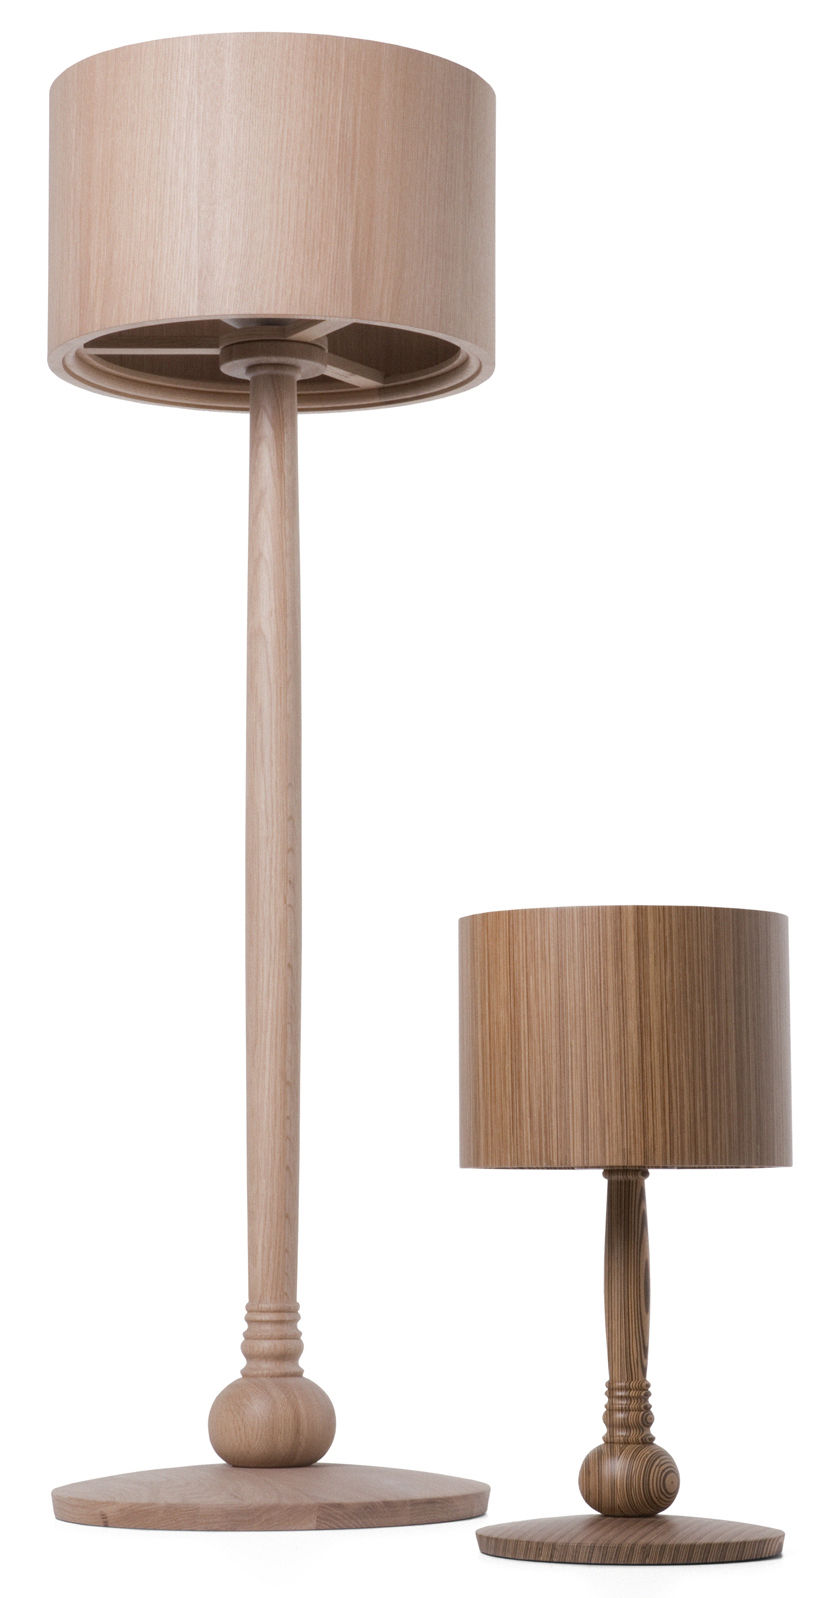 Lampe de table tree lamp ch ne teint jaune moooi for Lampe de table jaune